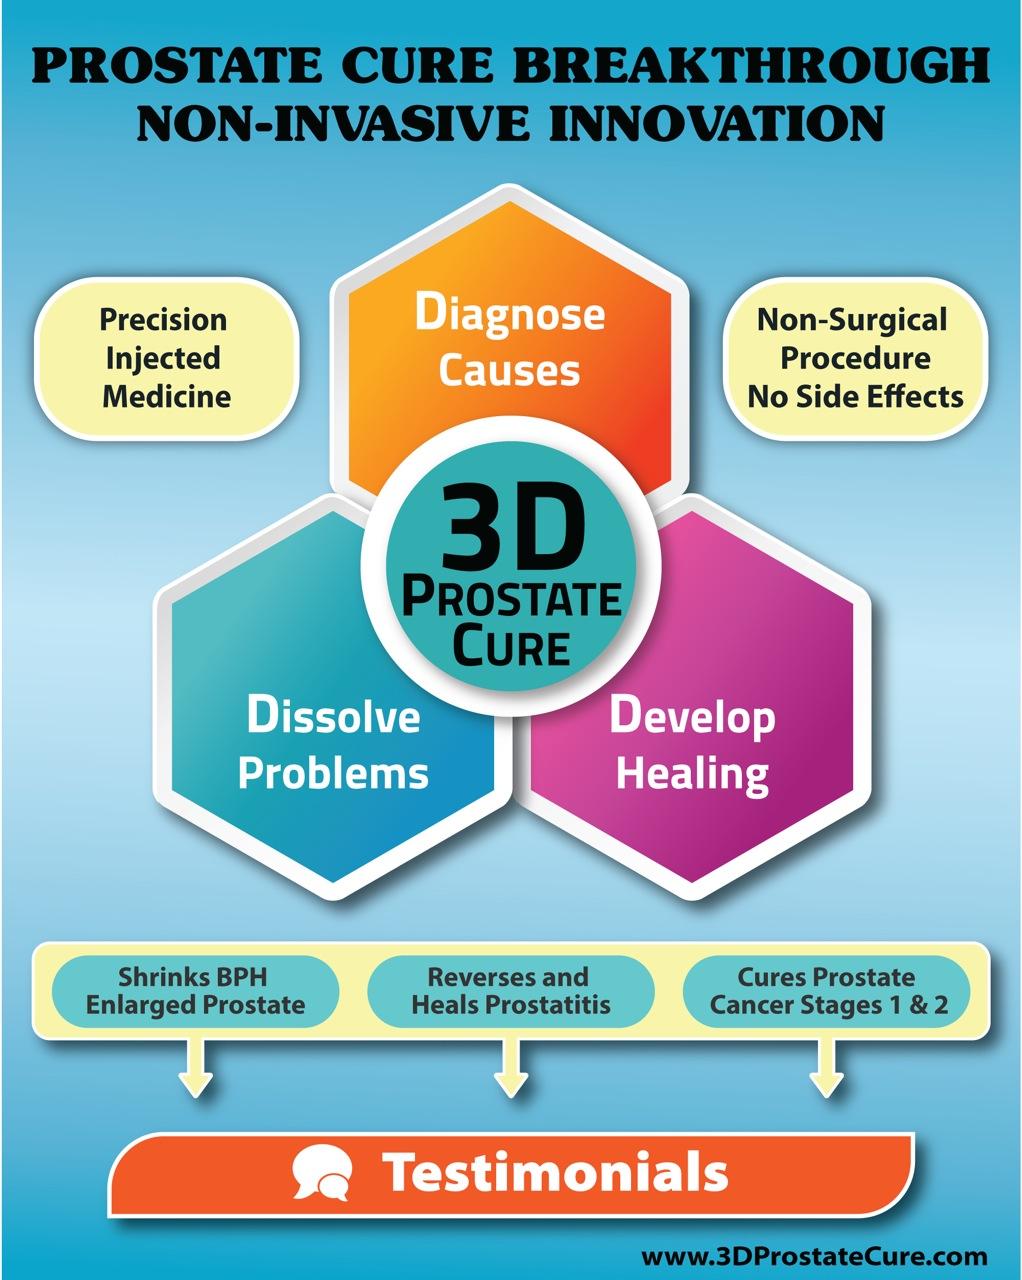 3D-Prostate-Cure.com